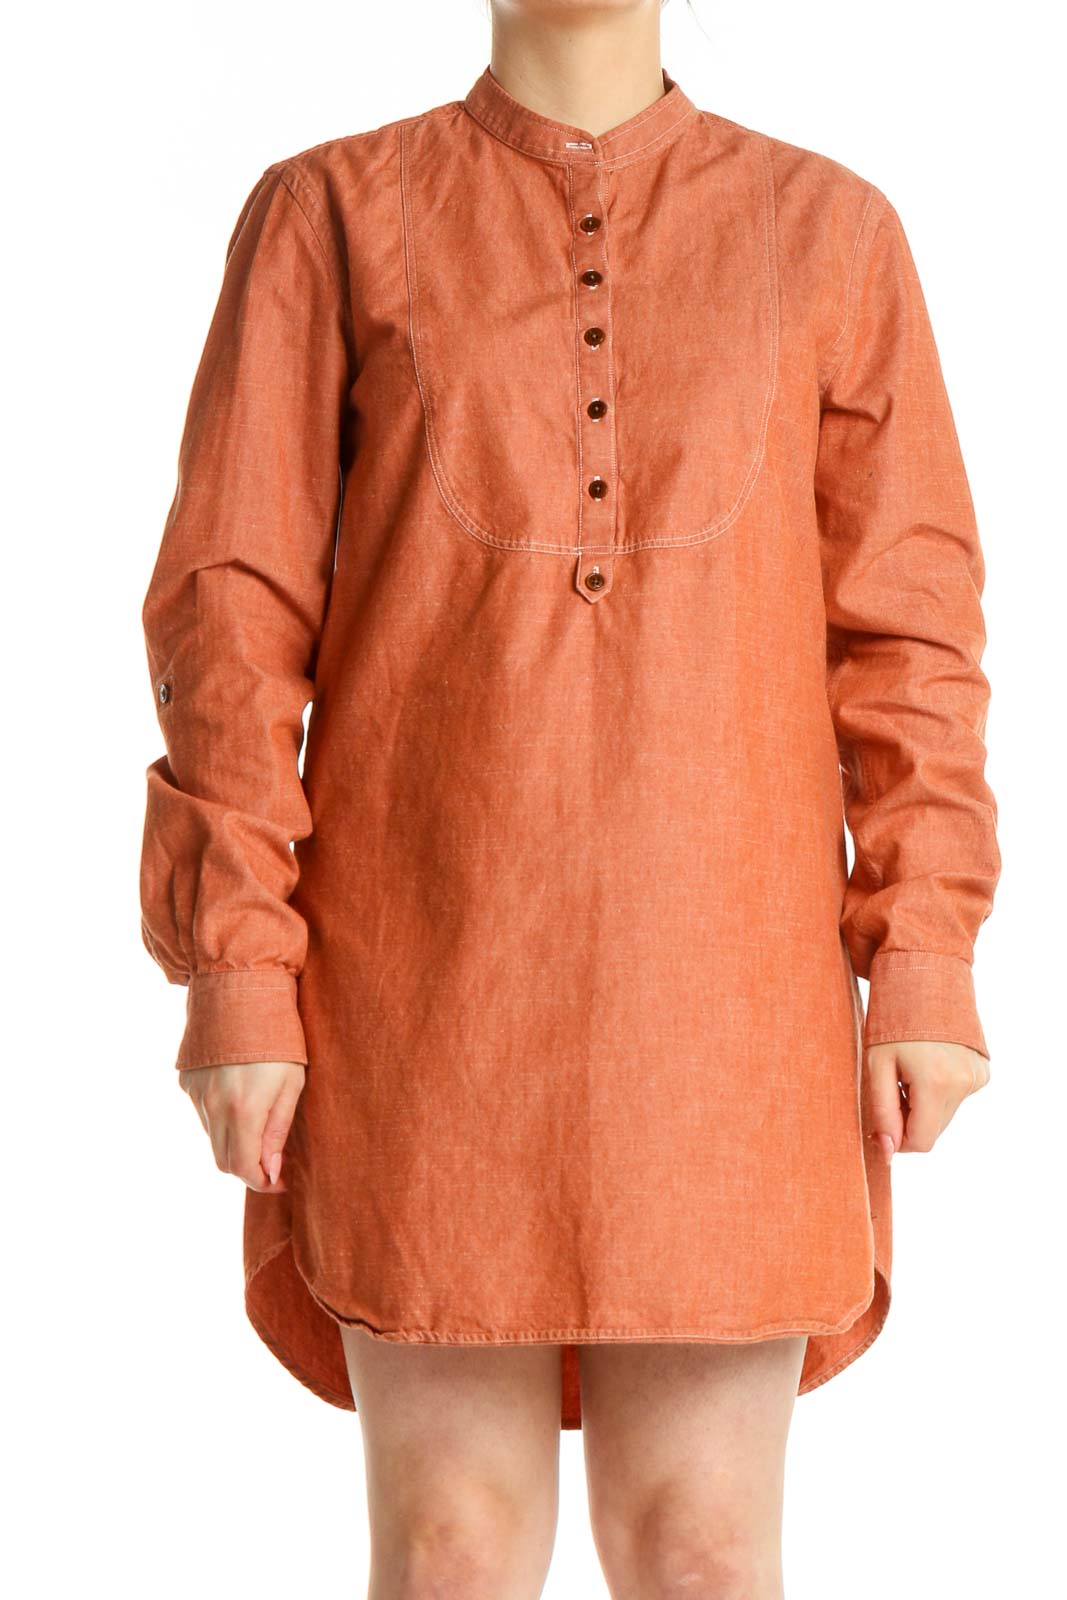 Orange Solid Retro Shift Dress Front